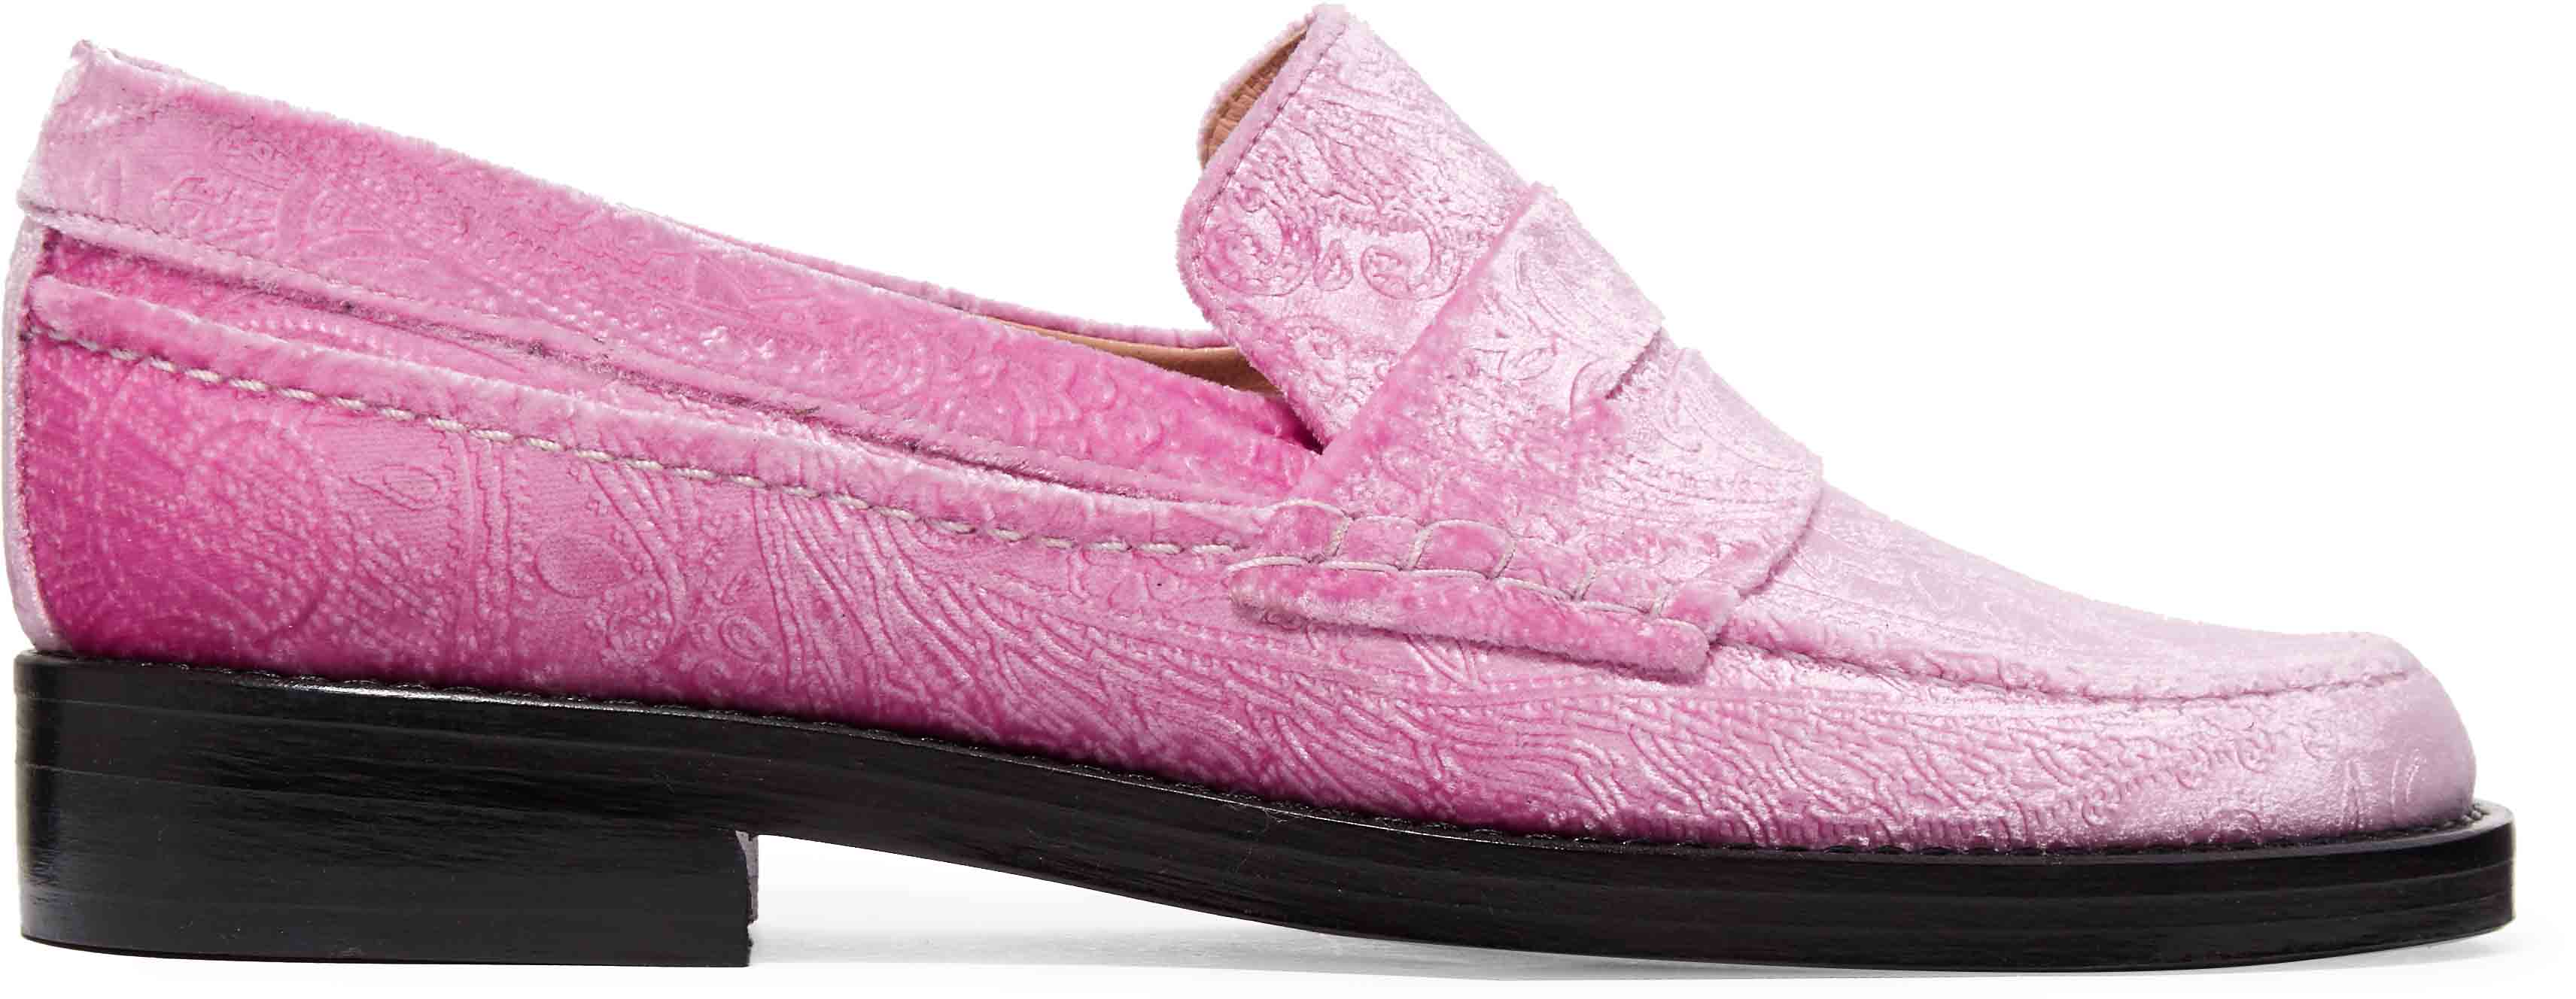 Man Repeller Leandra Medine Net A Porter Shoes Boots